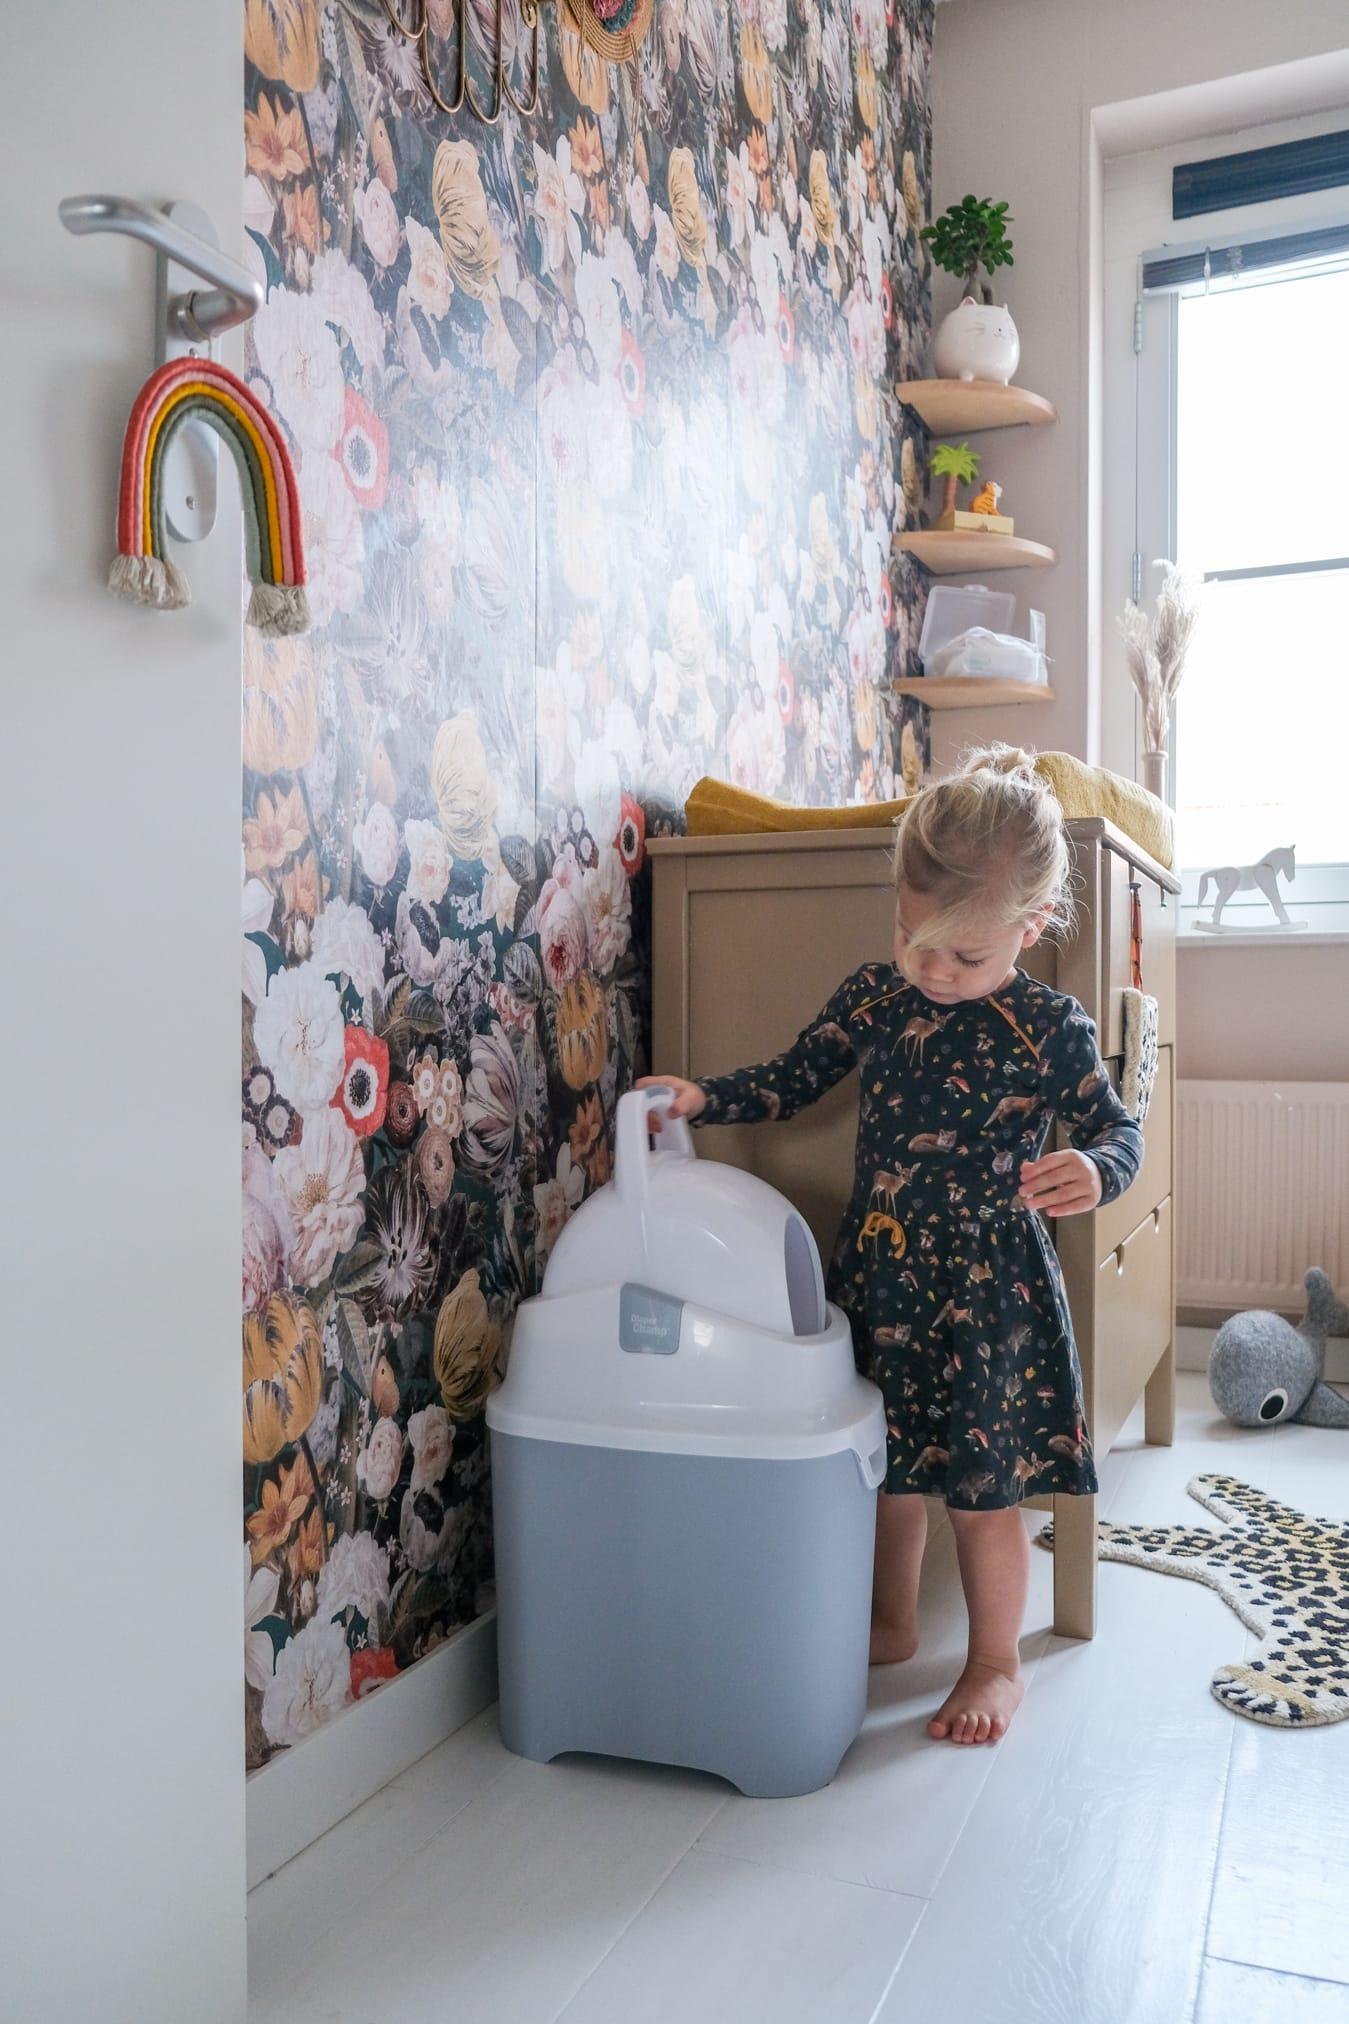 diaperchamp one ervaring duurzame luiers